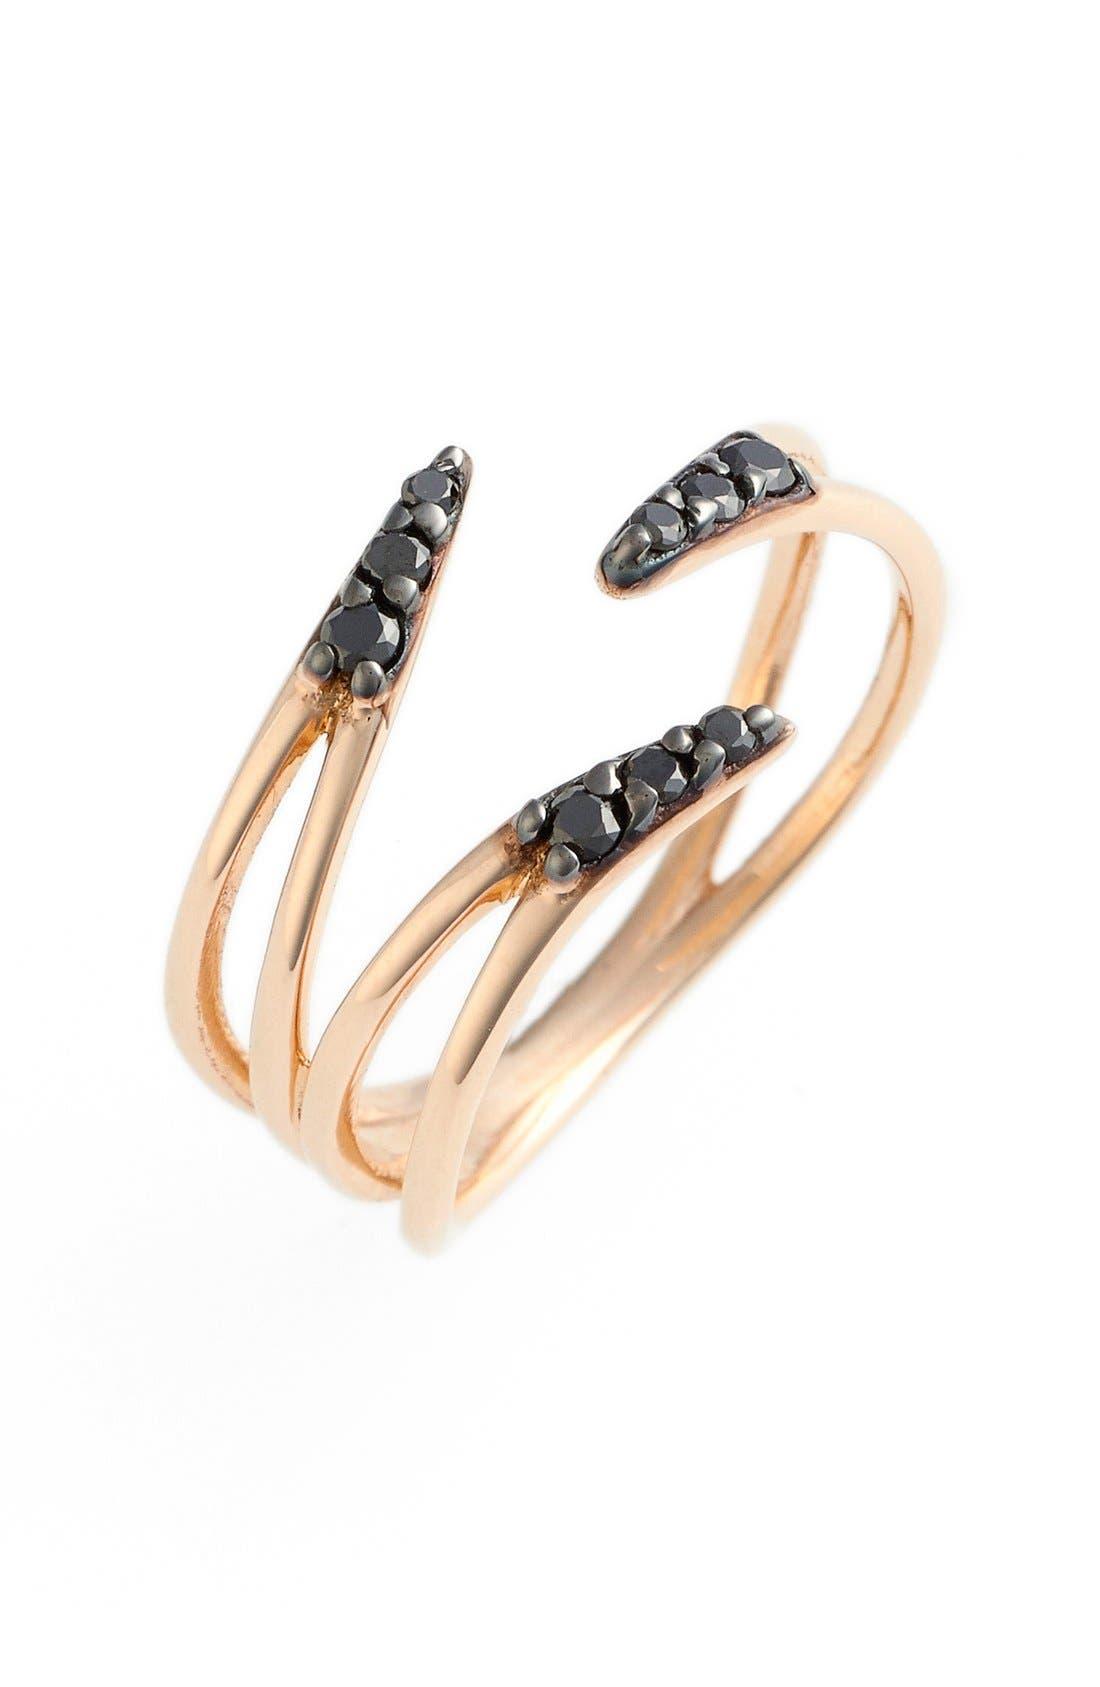 Main Image - kismet by milka 'Lumiere' Diamond Pinky Ring